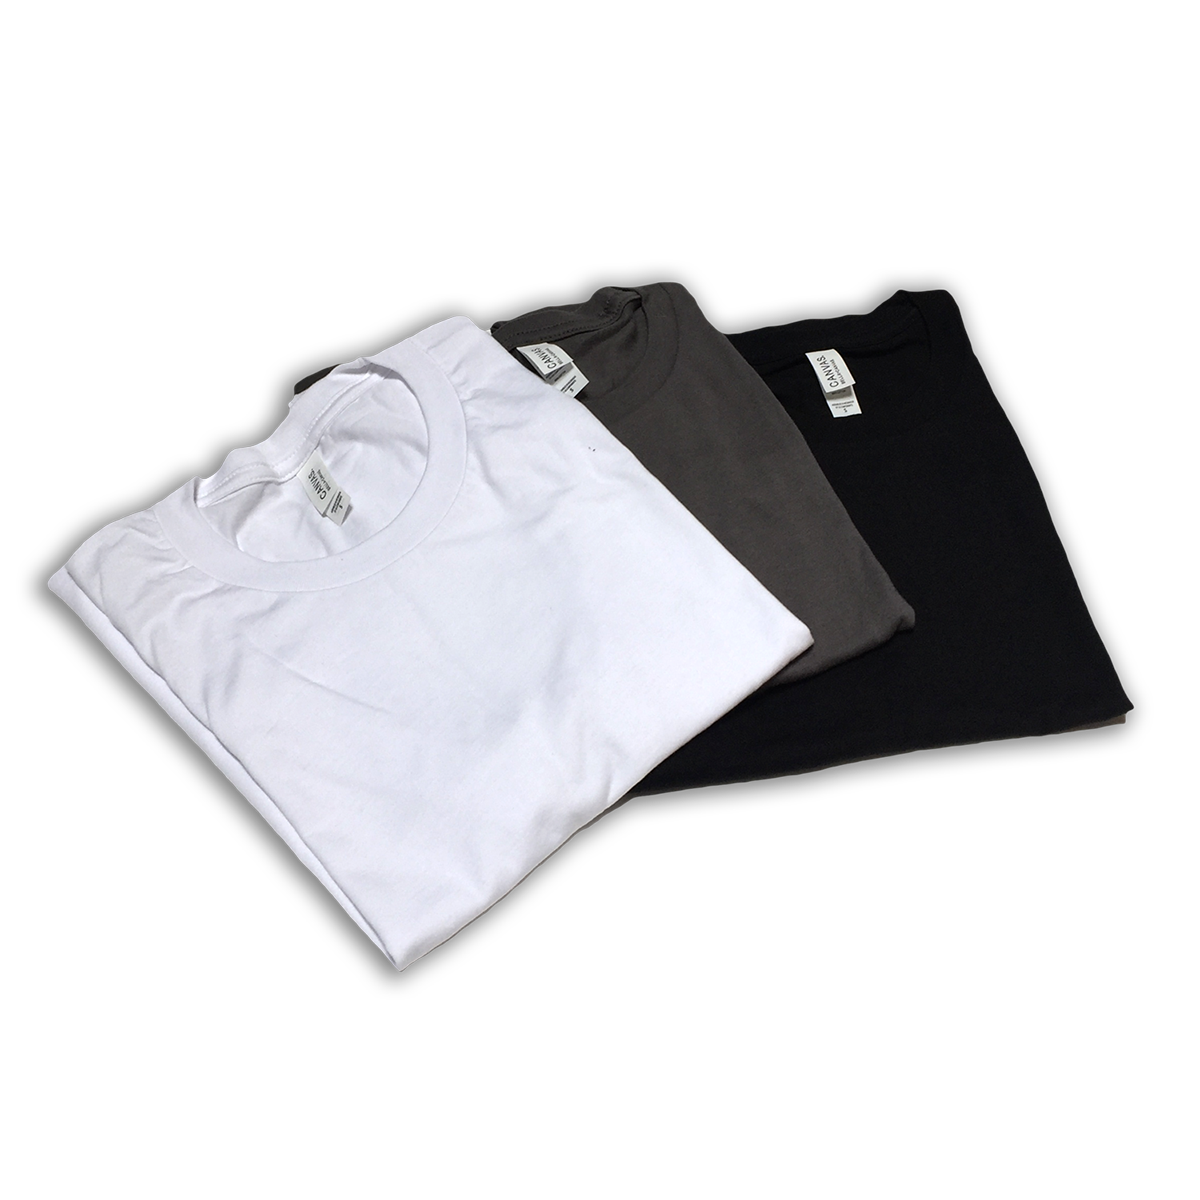 Hoodrich 3-Pack Neutral T-Shirts